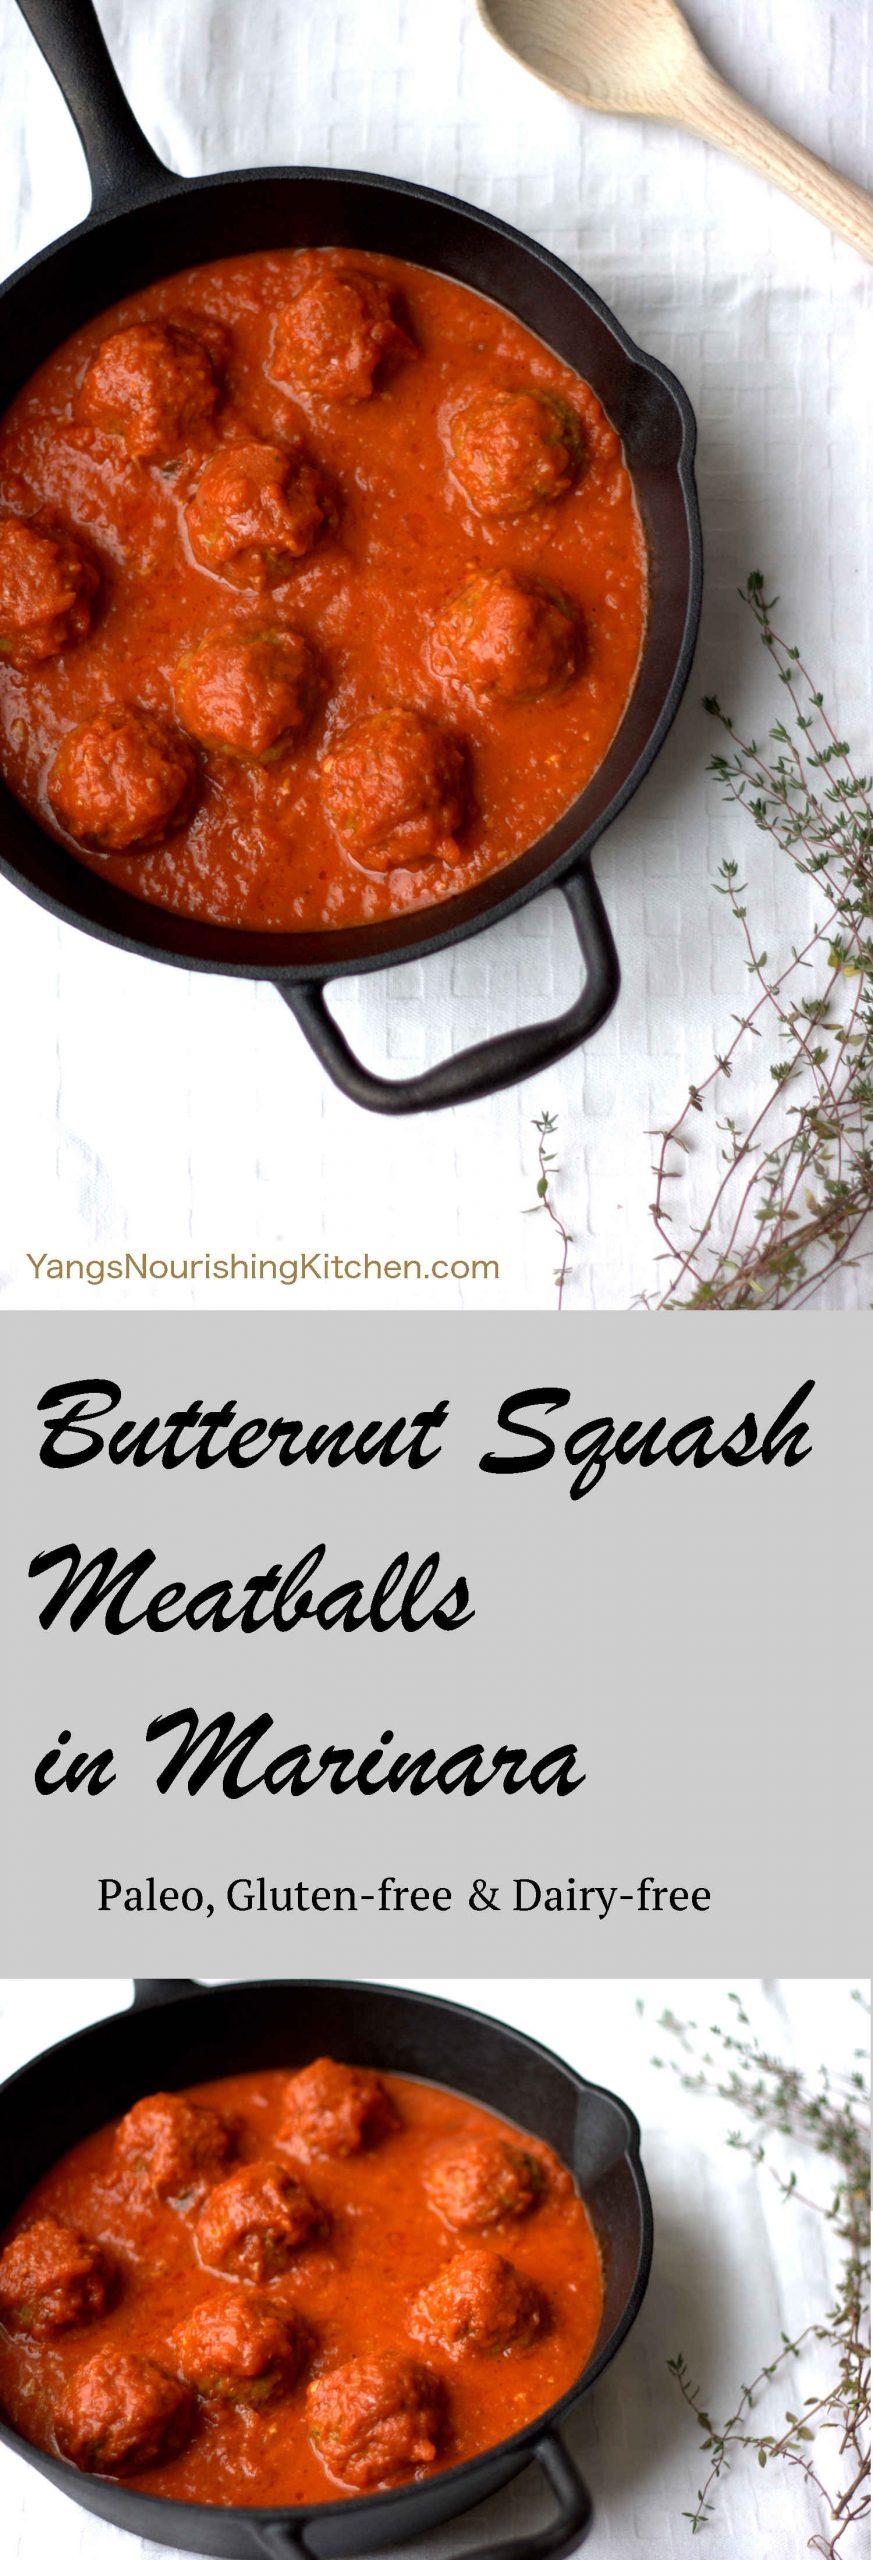 Butternut Squash Meatballs (Paleo, Whole 30)